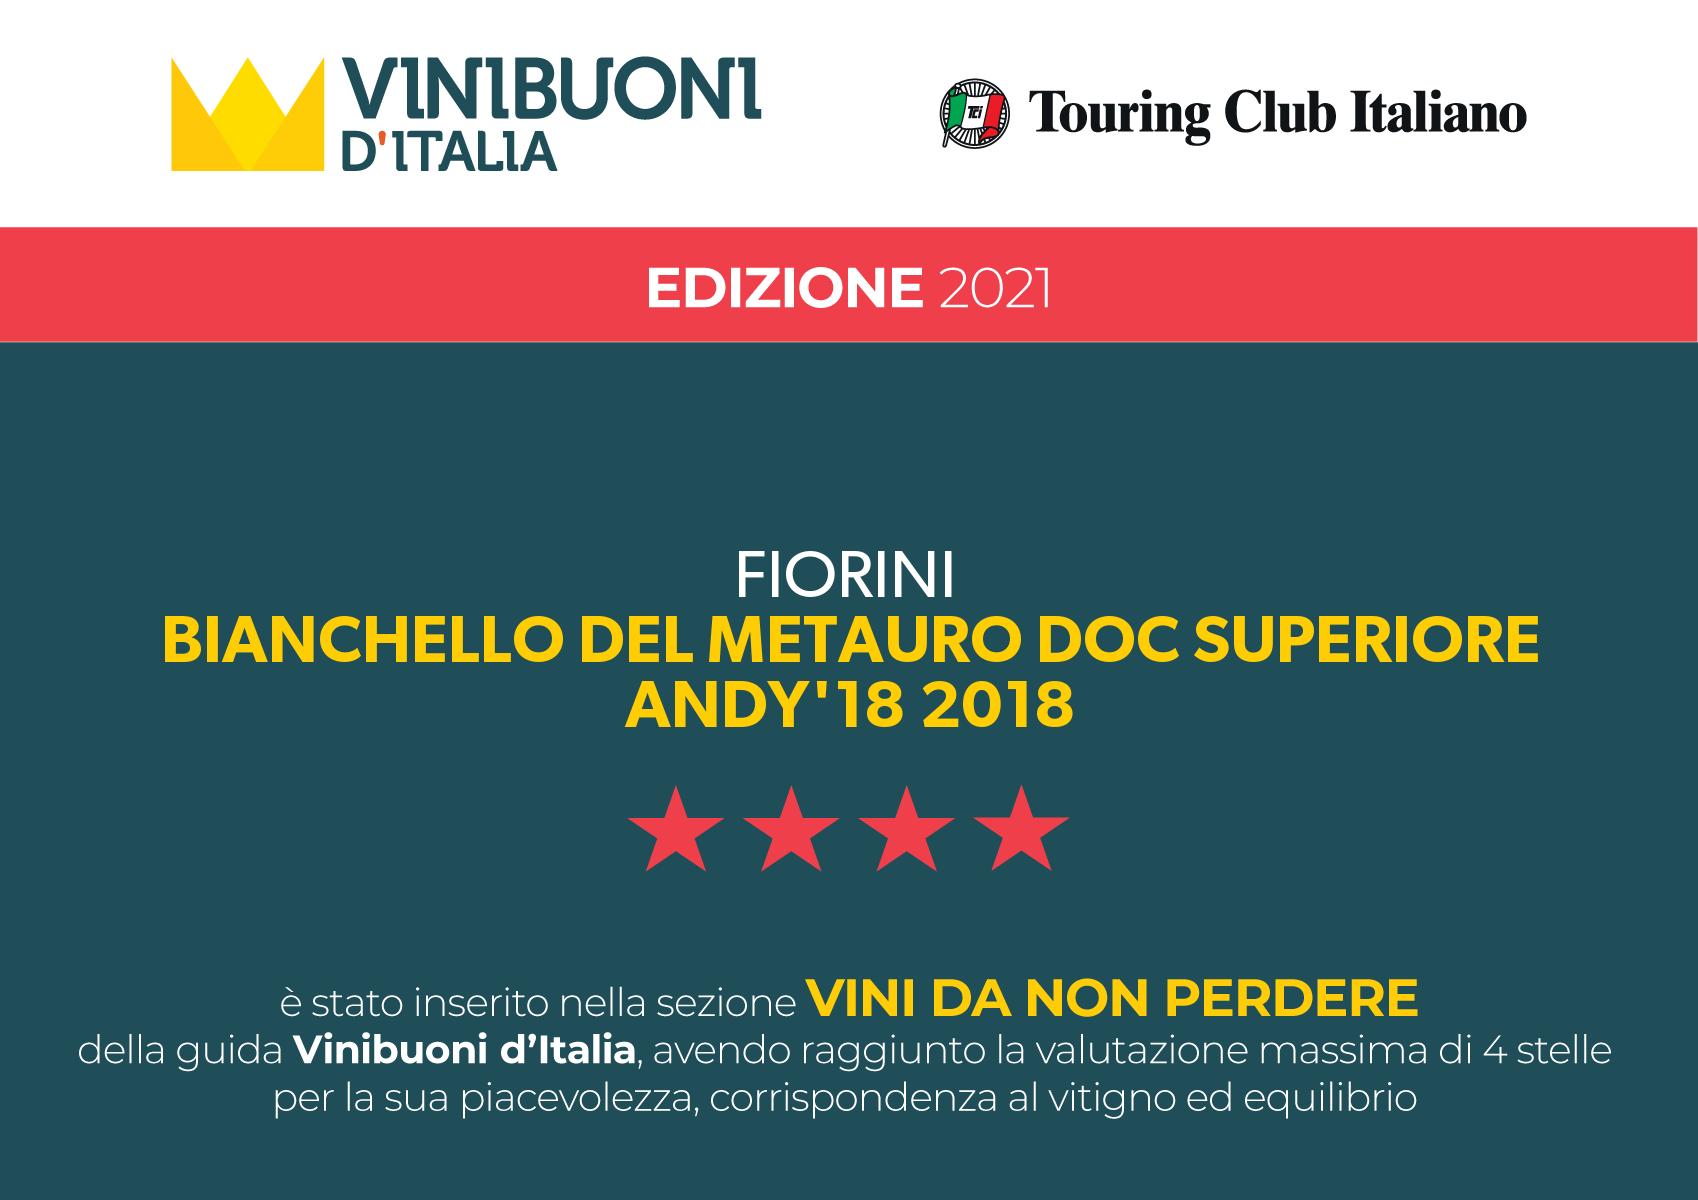 VINIBUONI D'ITALIA 2021 – ANDY'18